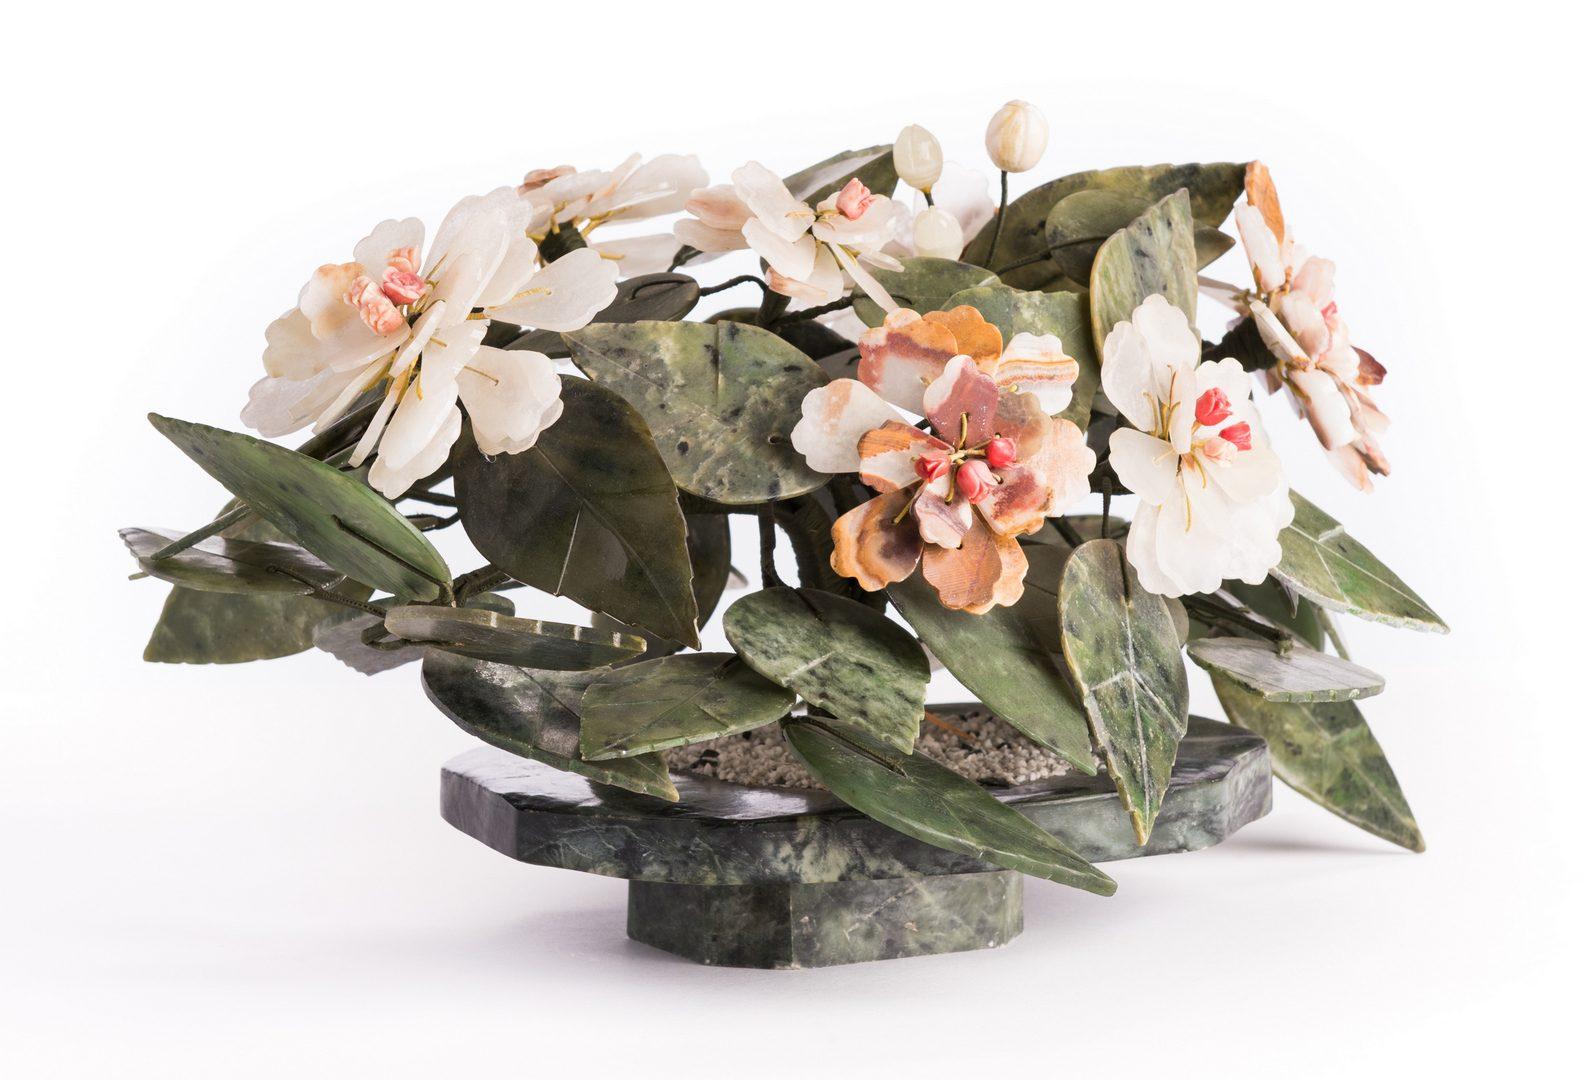 Lot 189: 3 Asian Hardstone Decorative Items